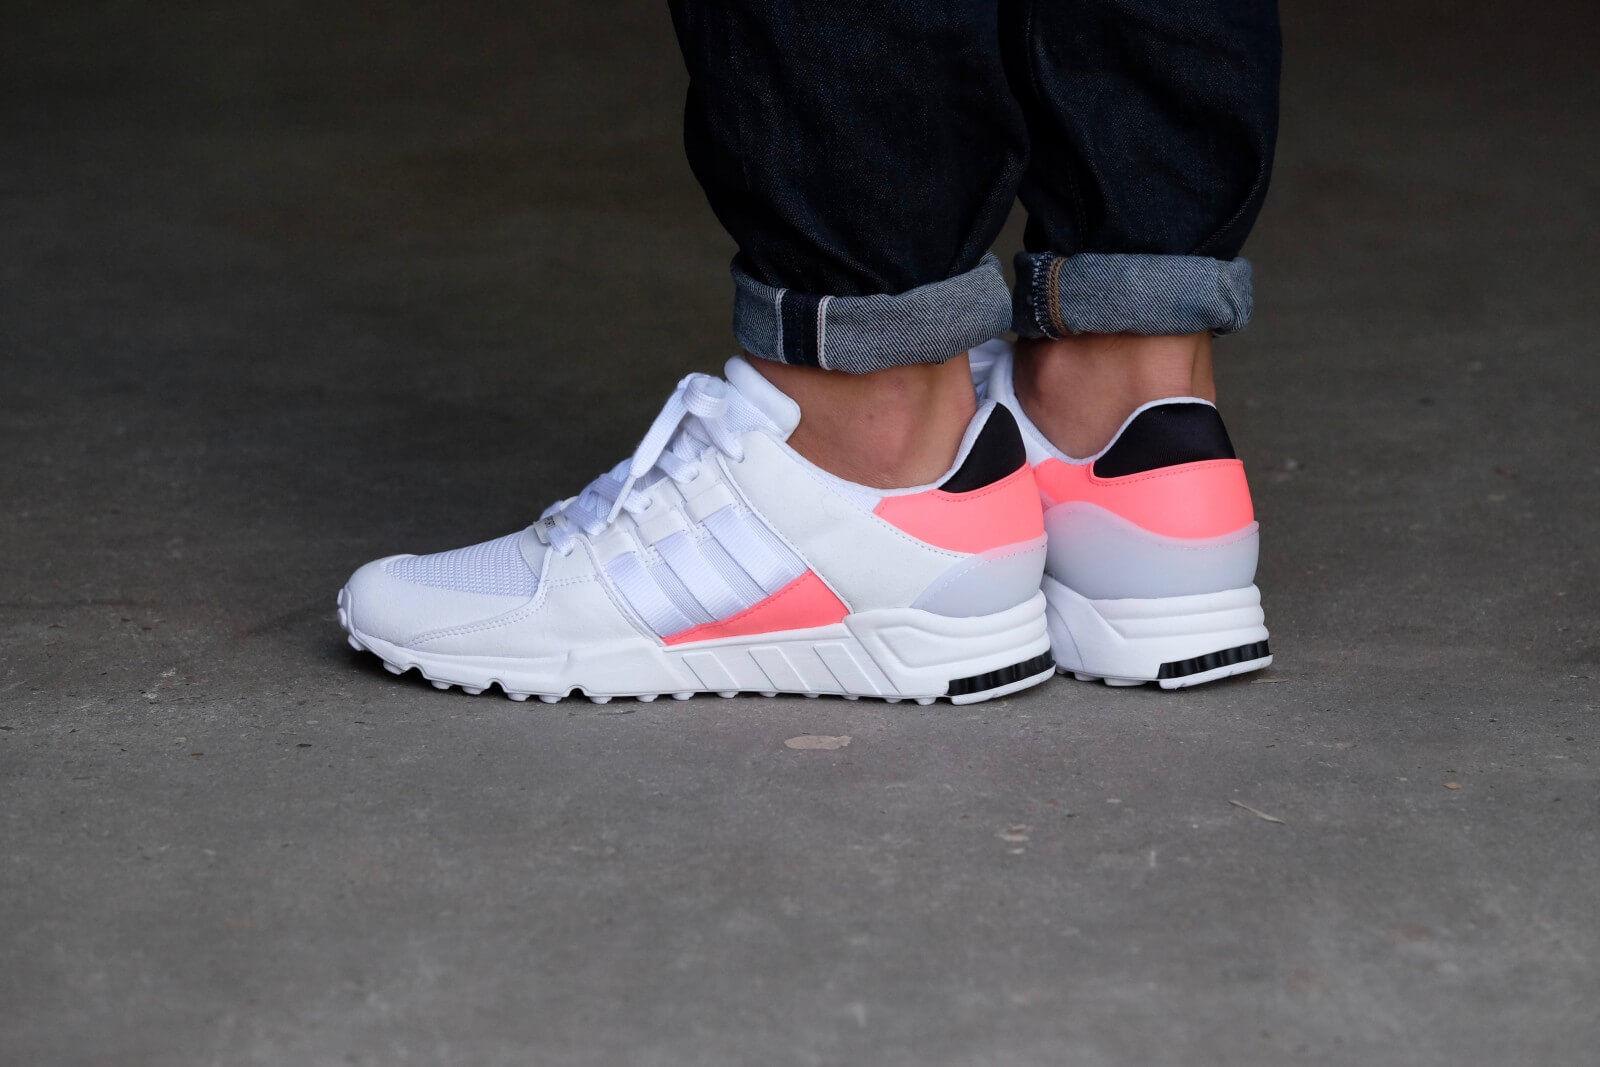 Adidas hommes Boys EQT Support RF Trainers BA7716 blanc/ rouge / noir 4.5-13.5